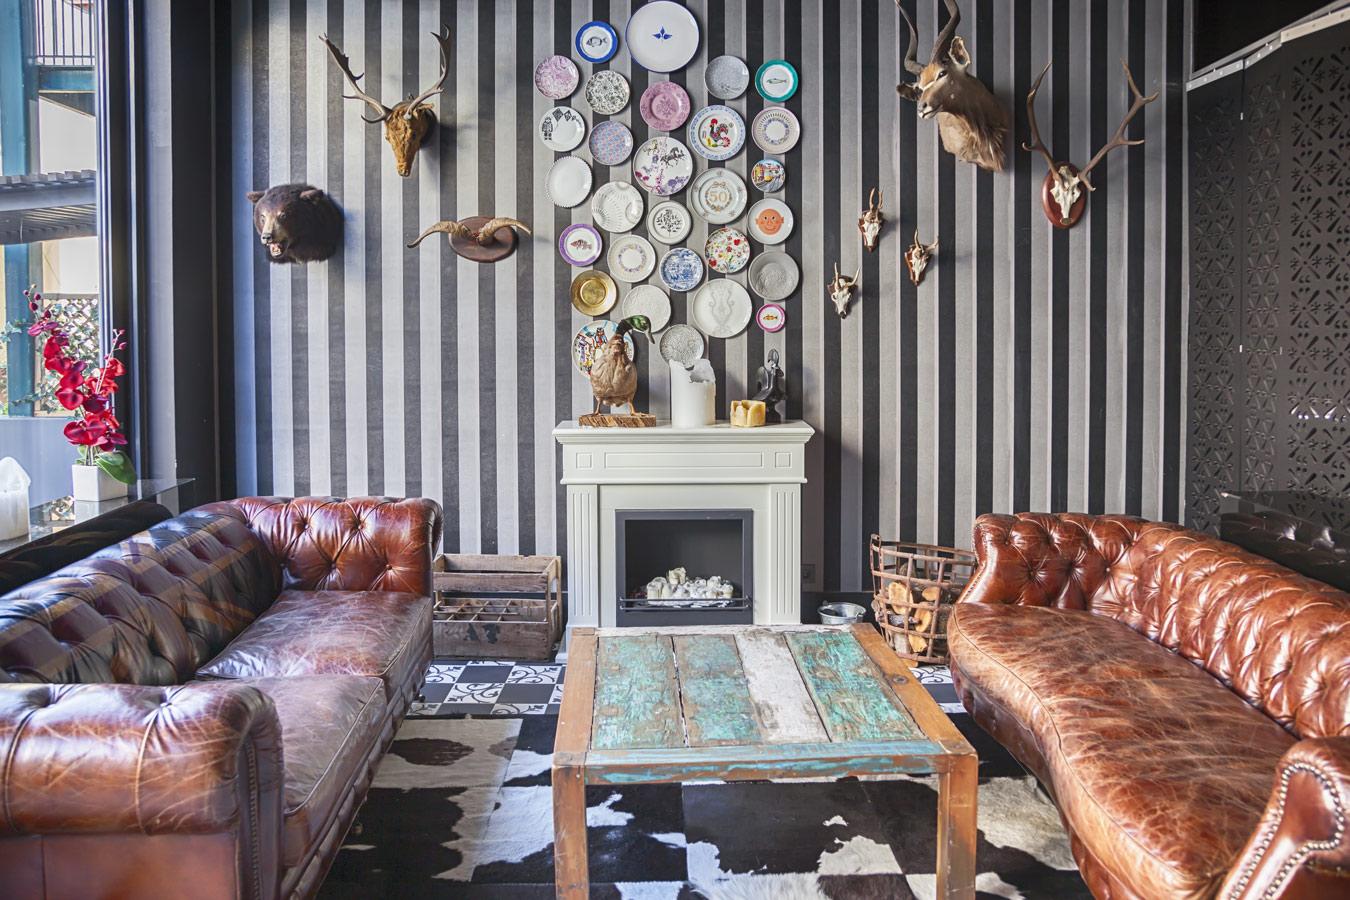 Muurdecoratie - Leuke tips & originele ideeën